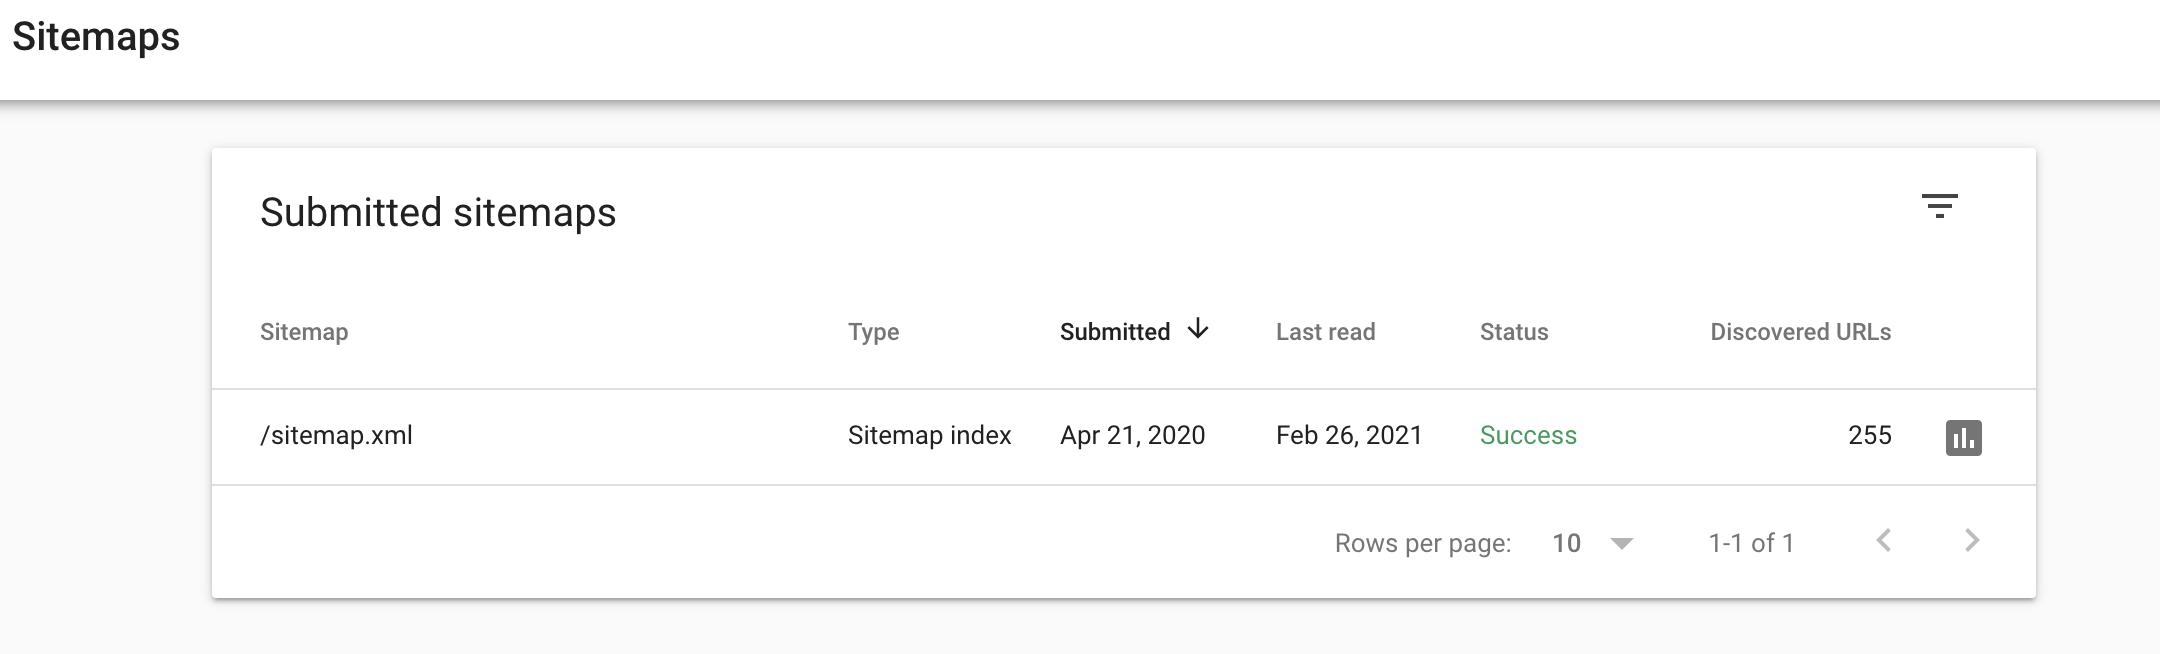 sitemaps consola de búsqueda de google